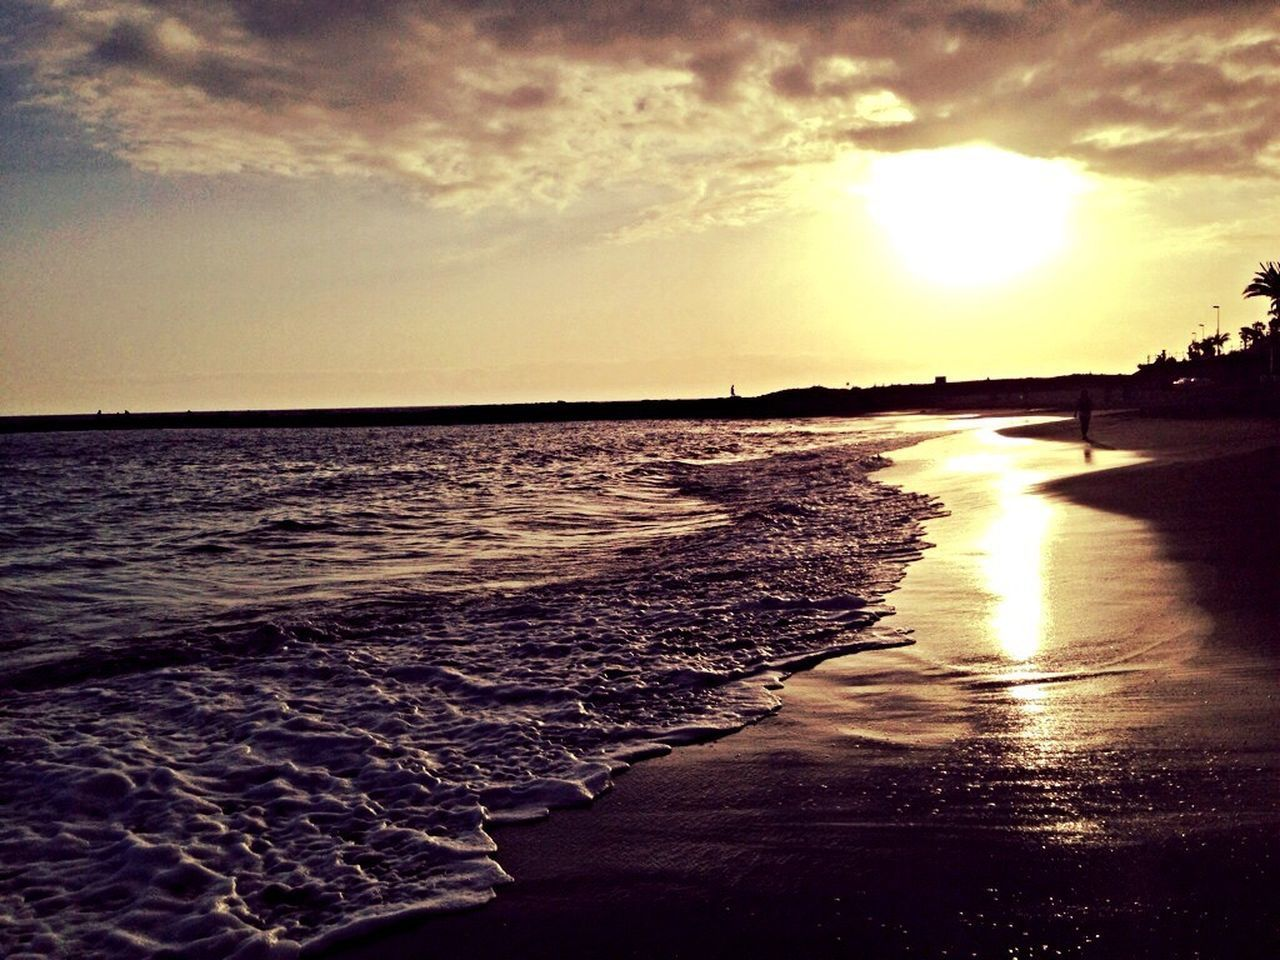 Atardecer Sea Sun Verano Tenerife Playa Beach Calor Sol Atardecer